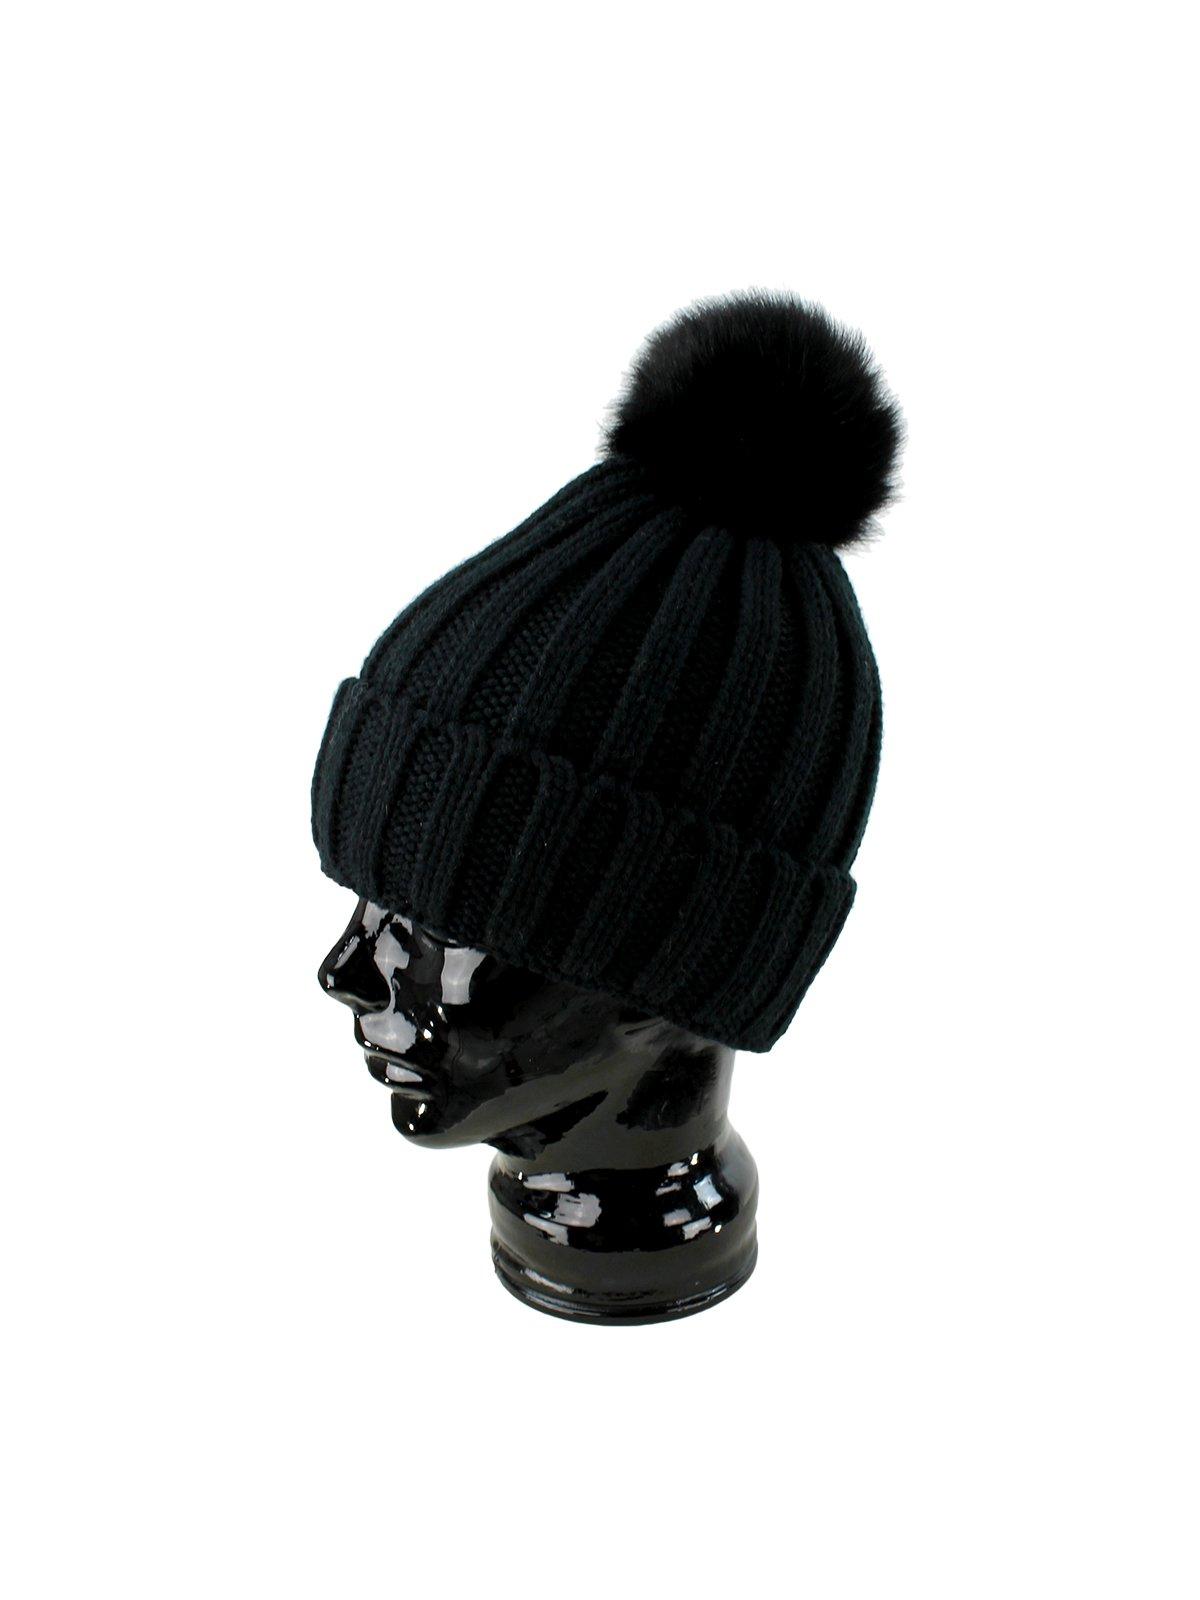 e472412f094 Black Womens Knit Hat with Black Fox Fur Pom Pom